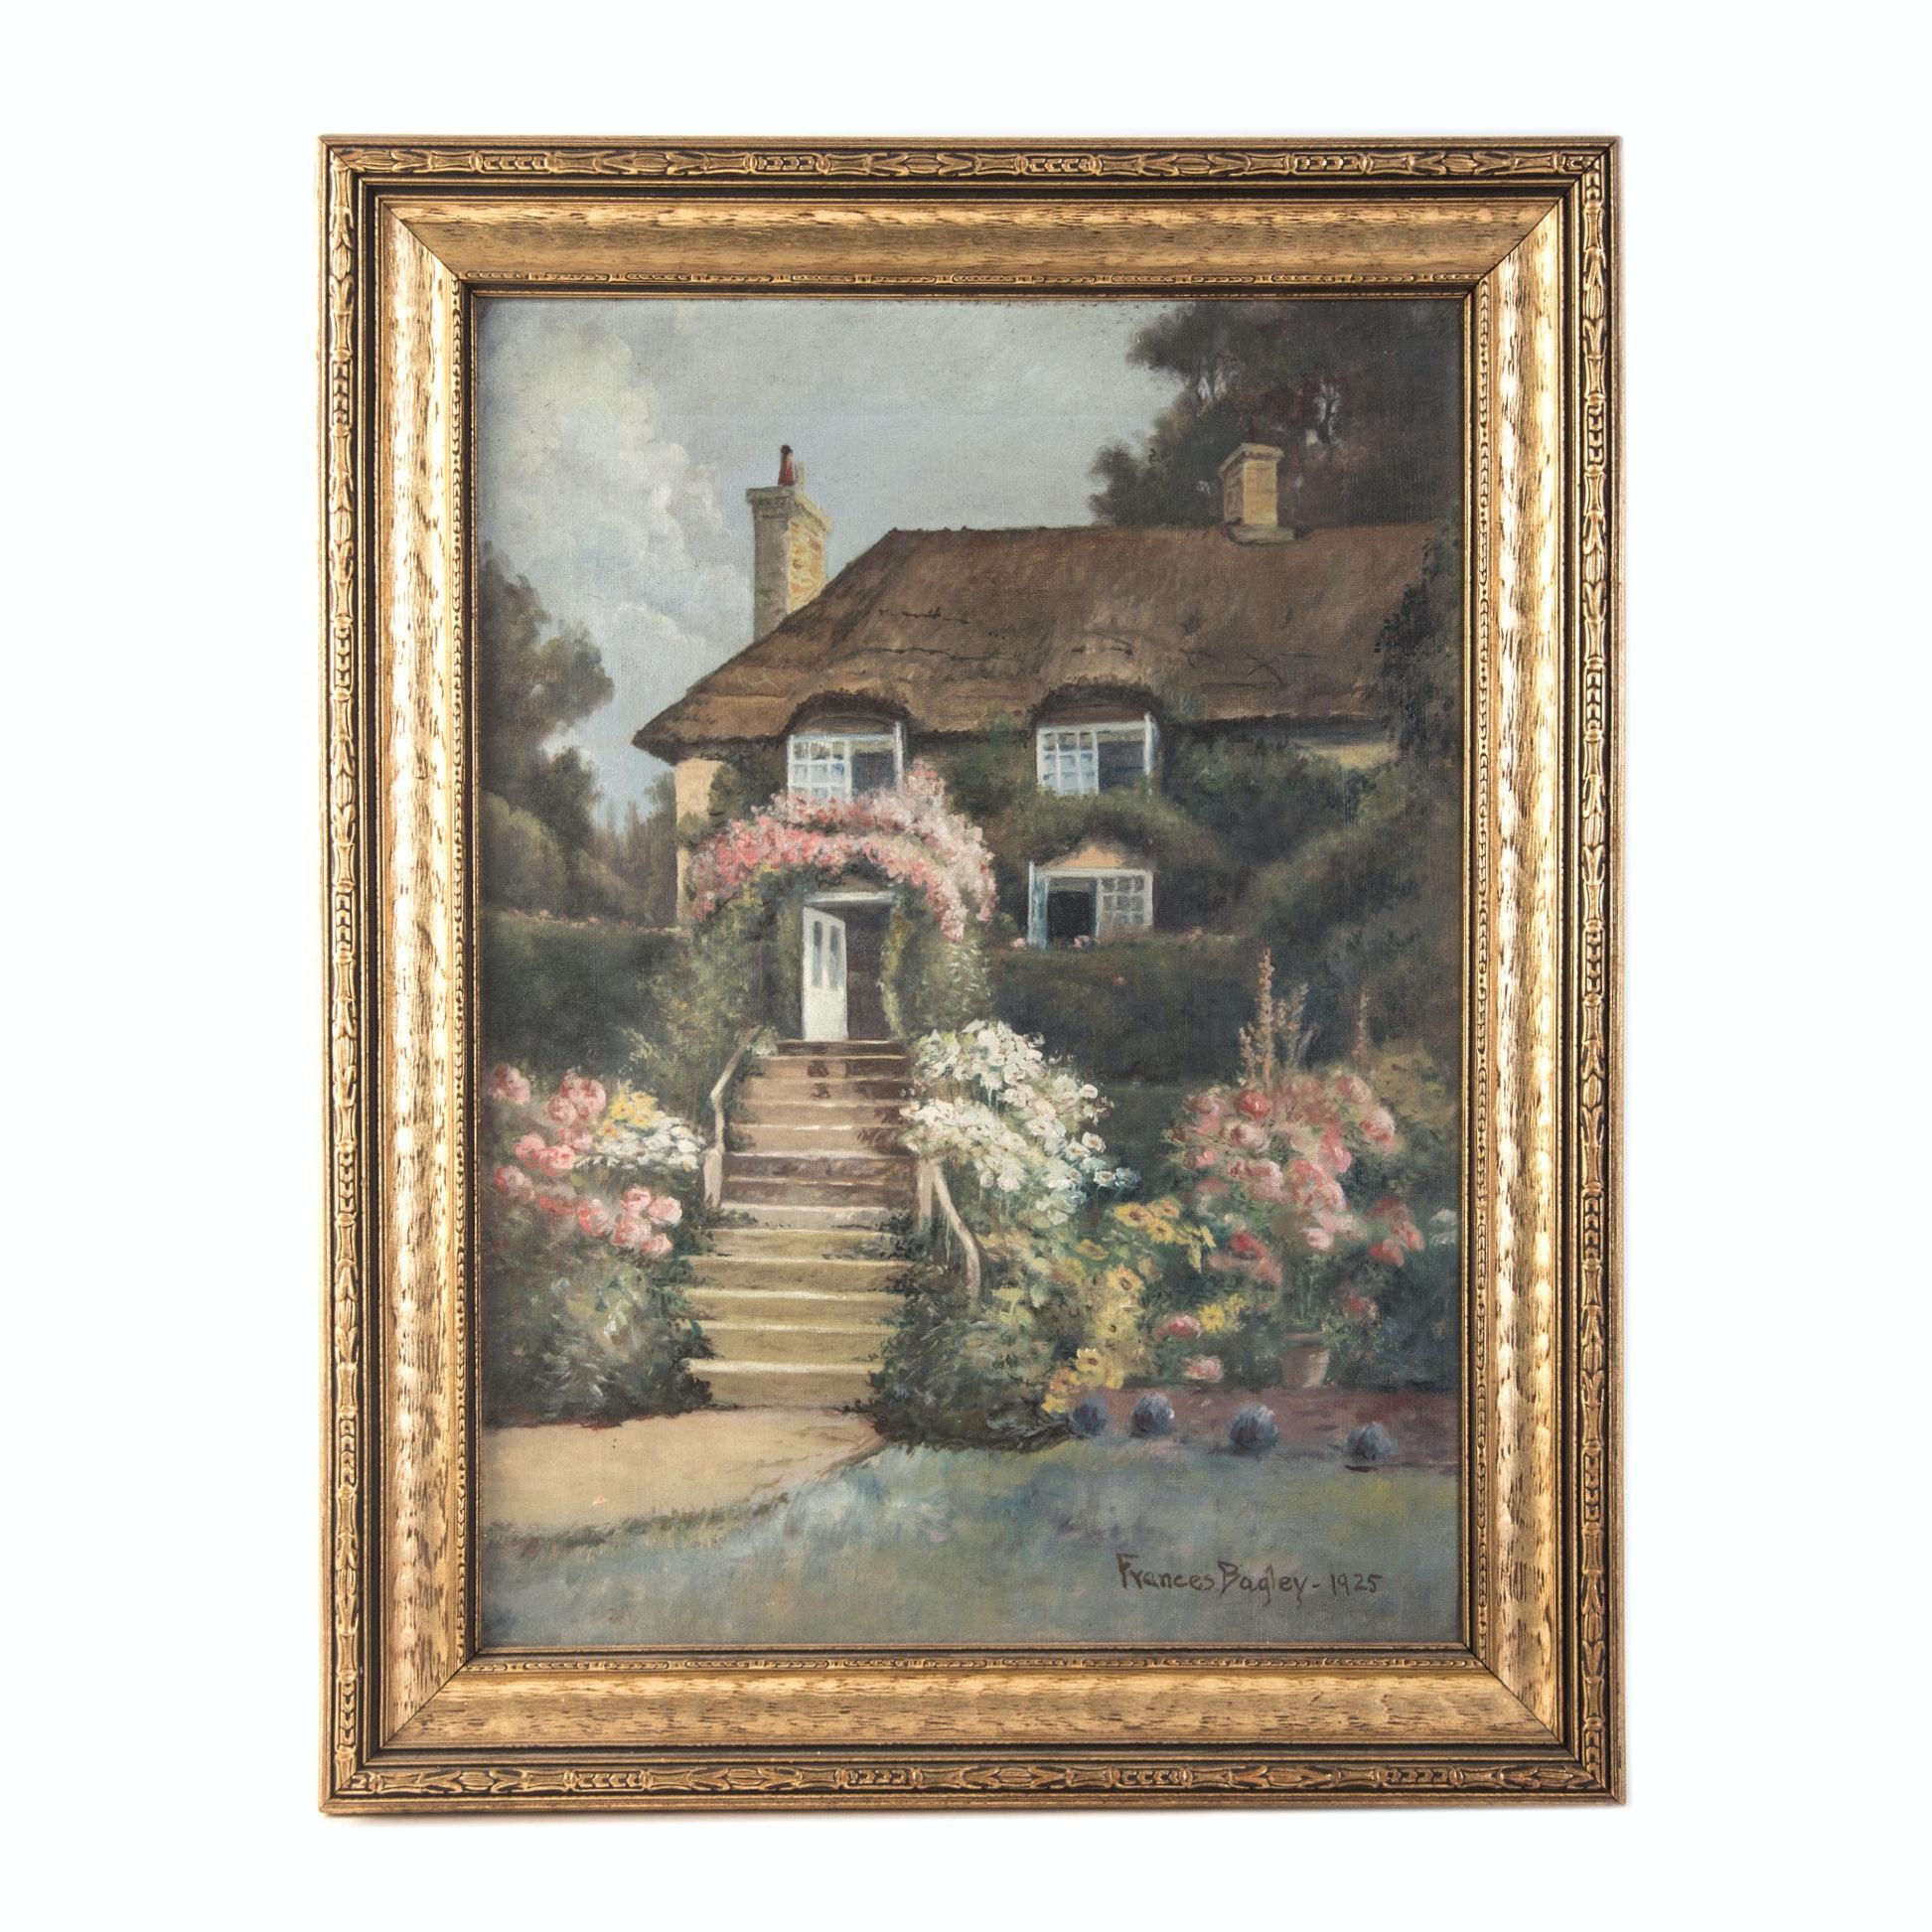 Frances Bagley Original Oil on Canvas